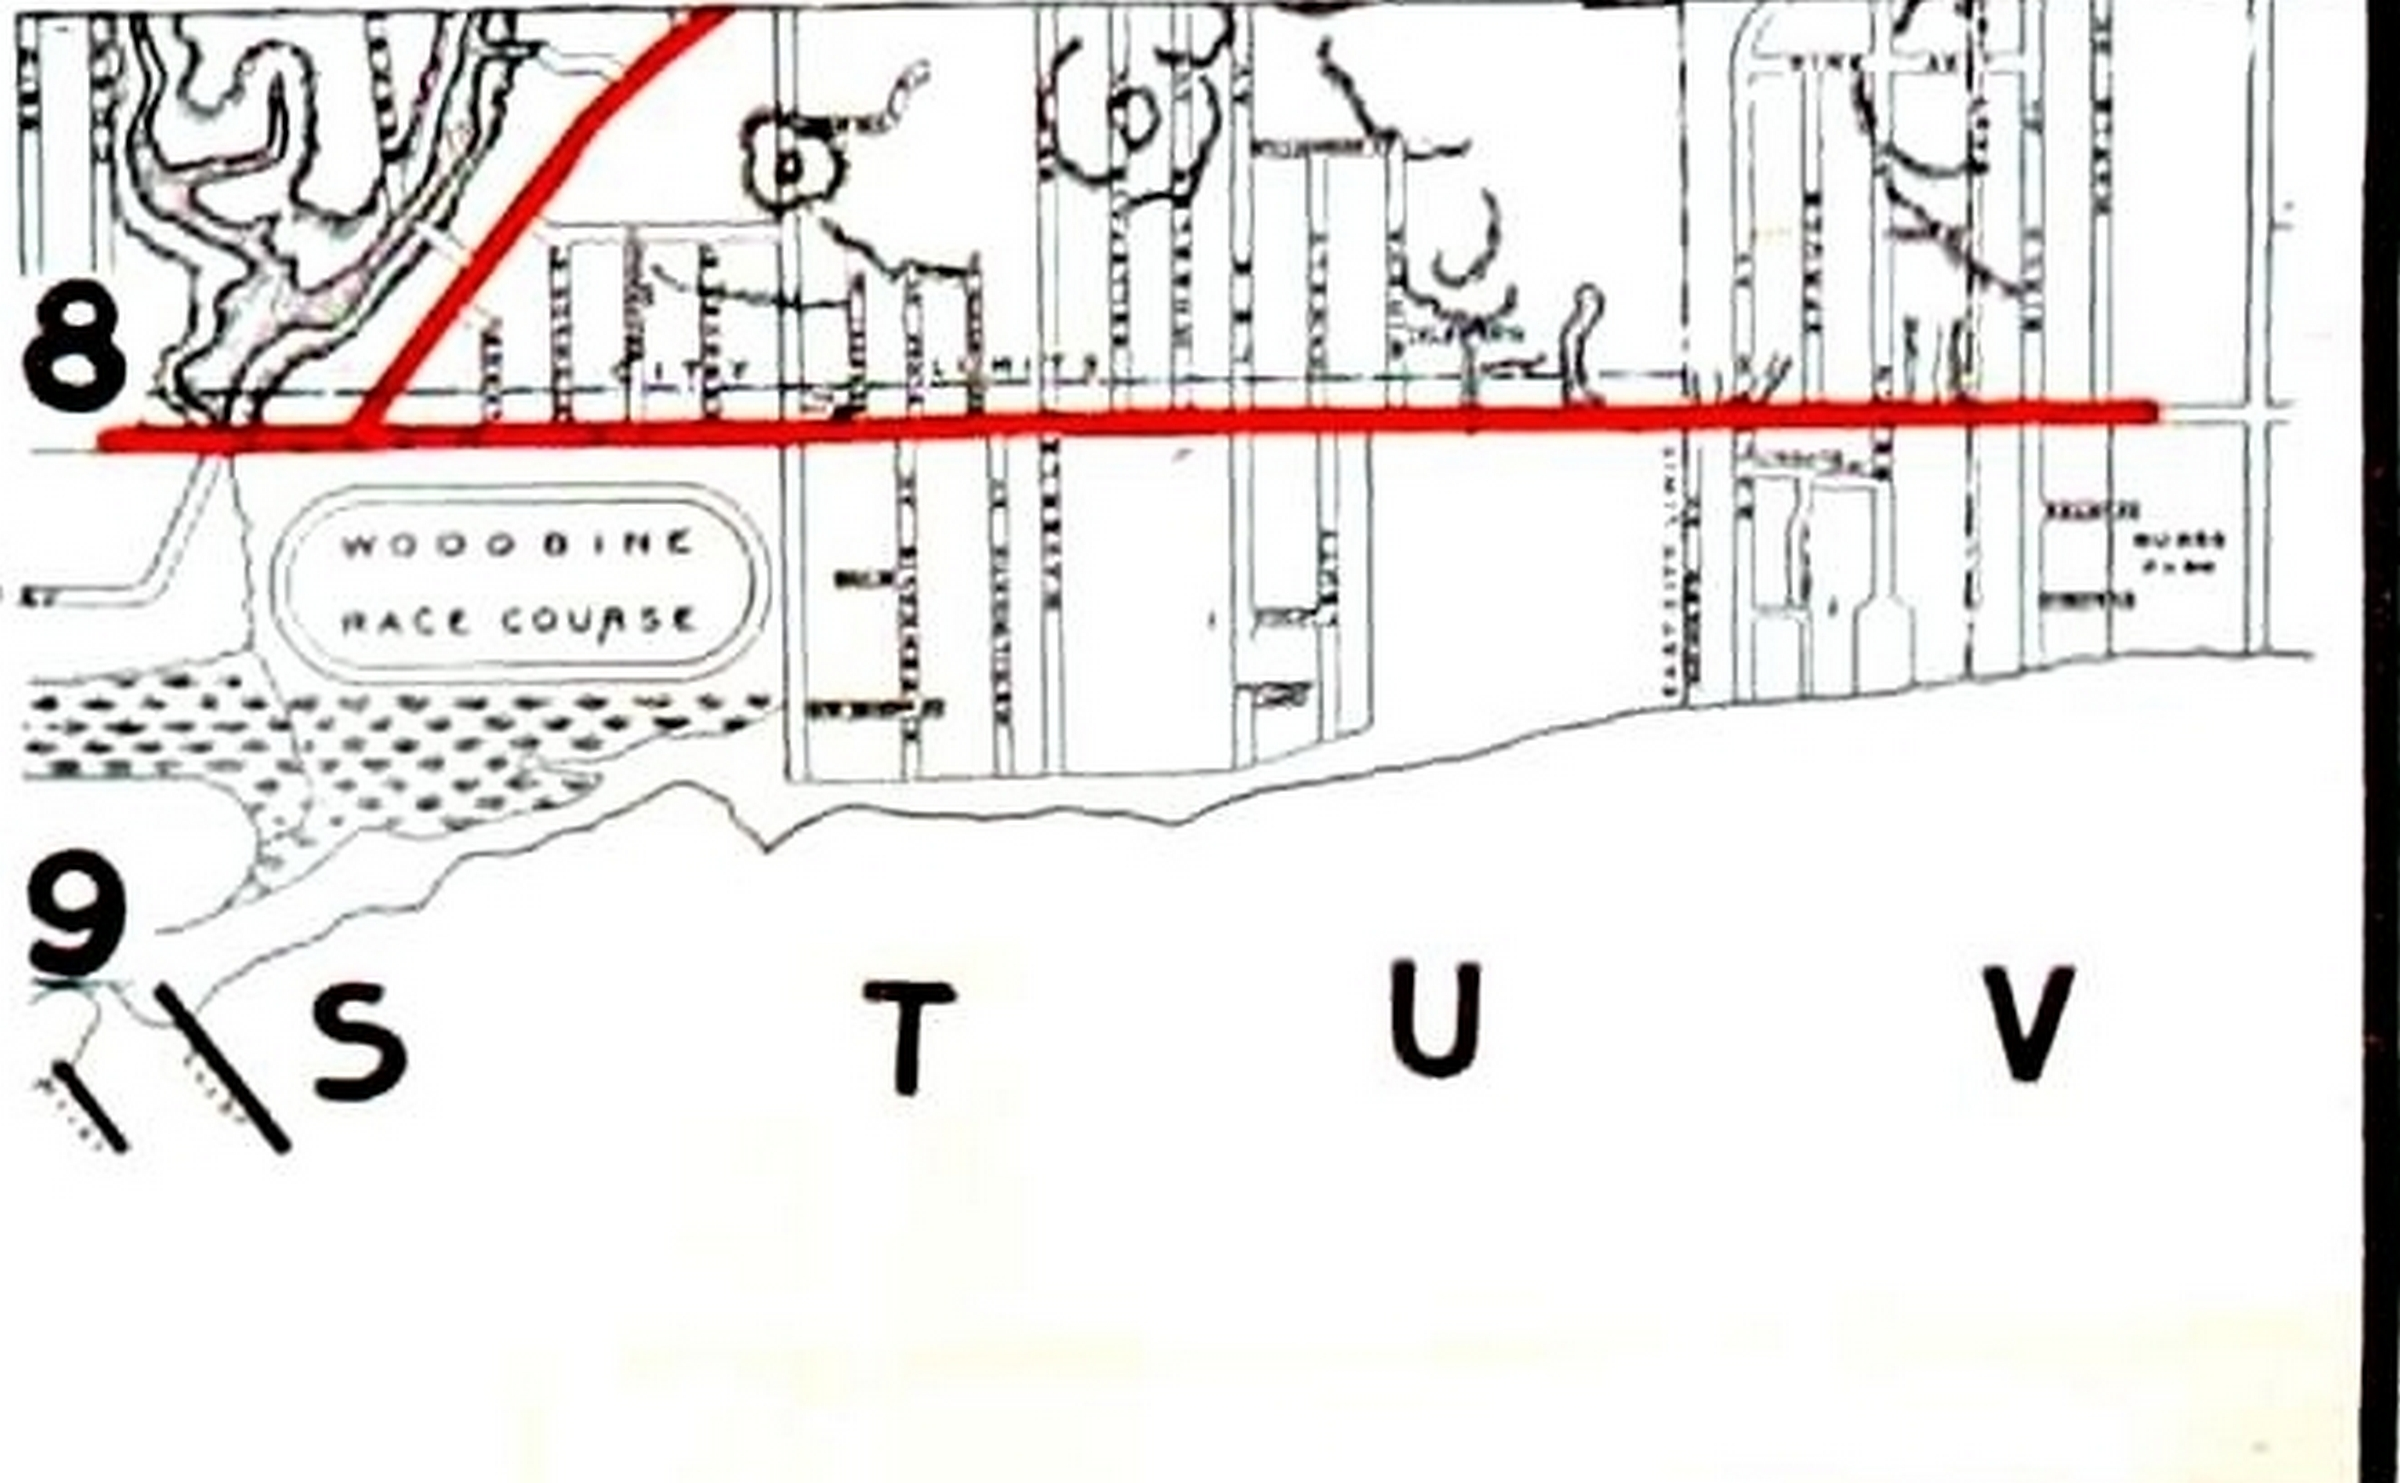 1912 Rex Chocolate Map the Beach